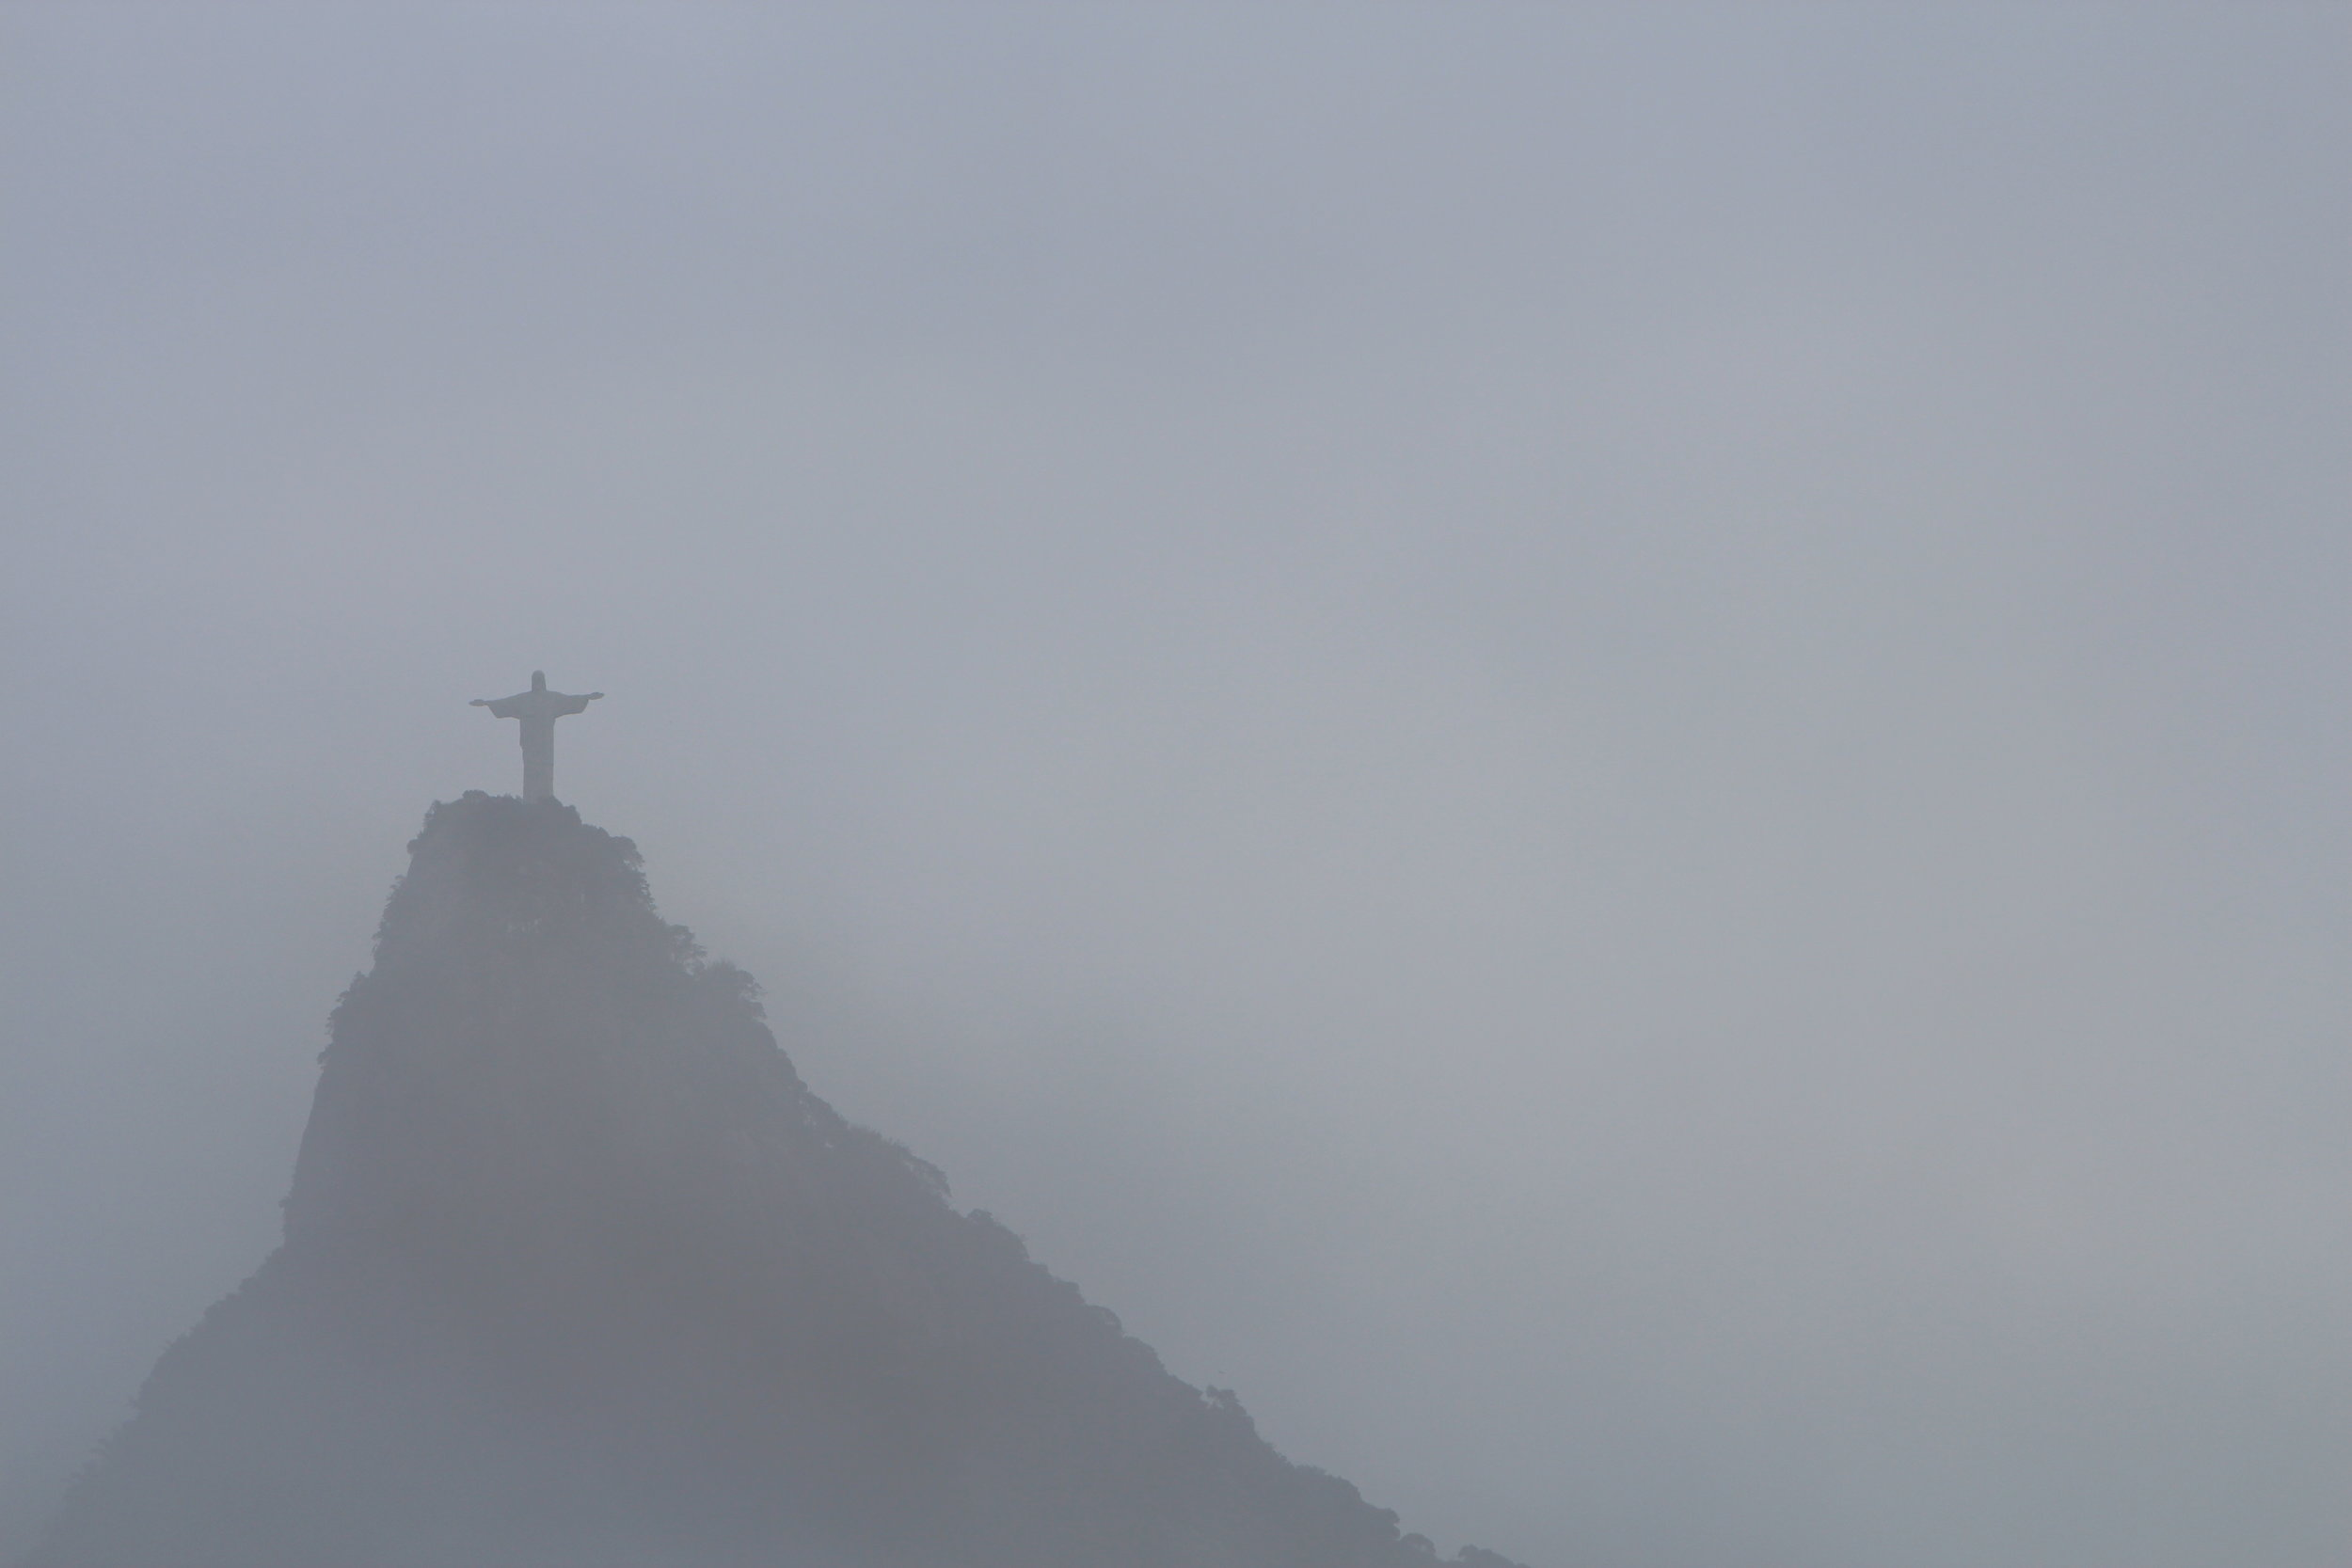 Even Christ the Redeemer is powerless to intervene